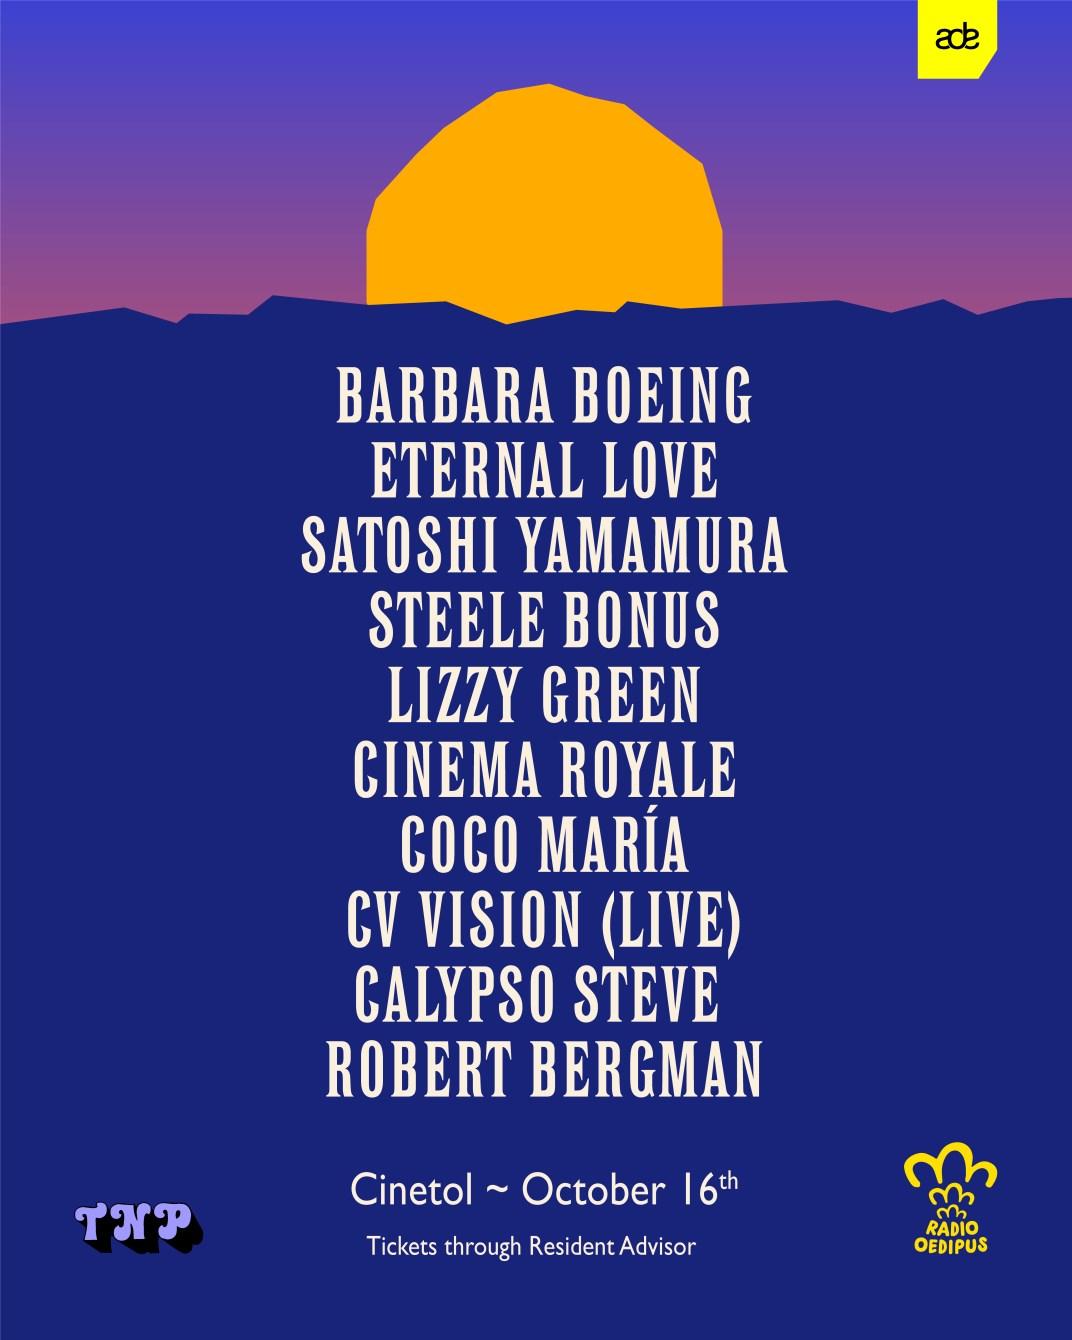 TNP ADE '21 - Barbara Boeing, Eternal Love, Satoshi Yamamura & More - Flyer front